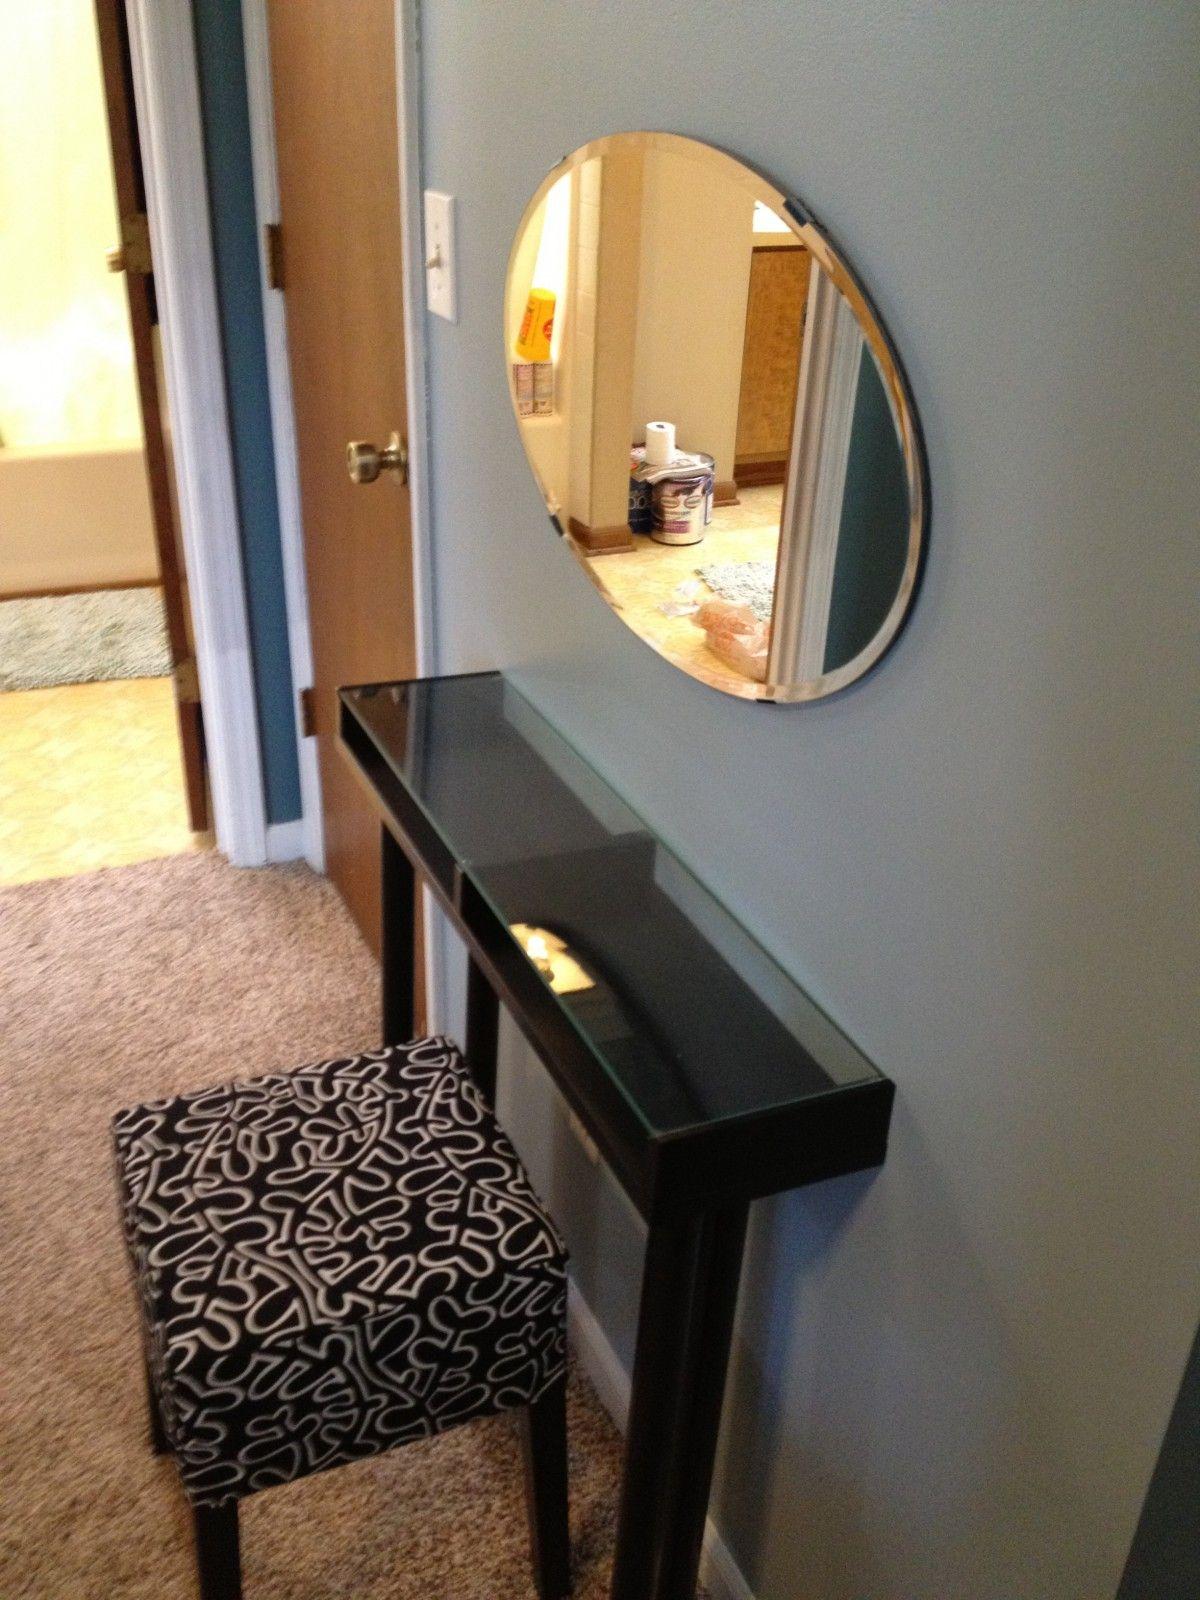 Ikea vanity hack decoraci n pinterest buenas ideas for Decoracion espejos ikea